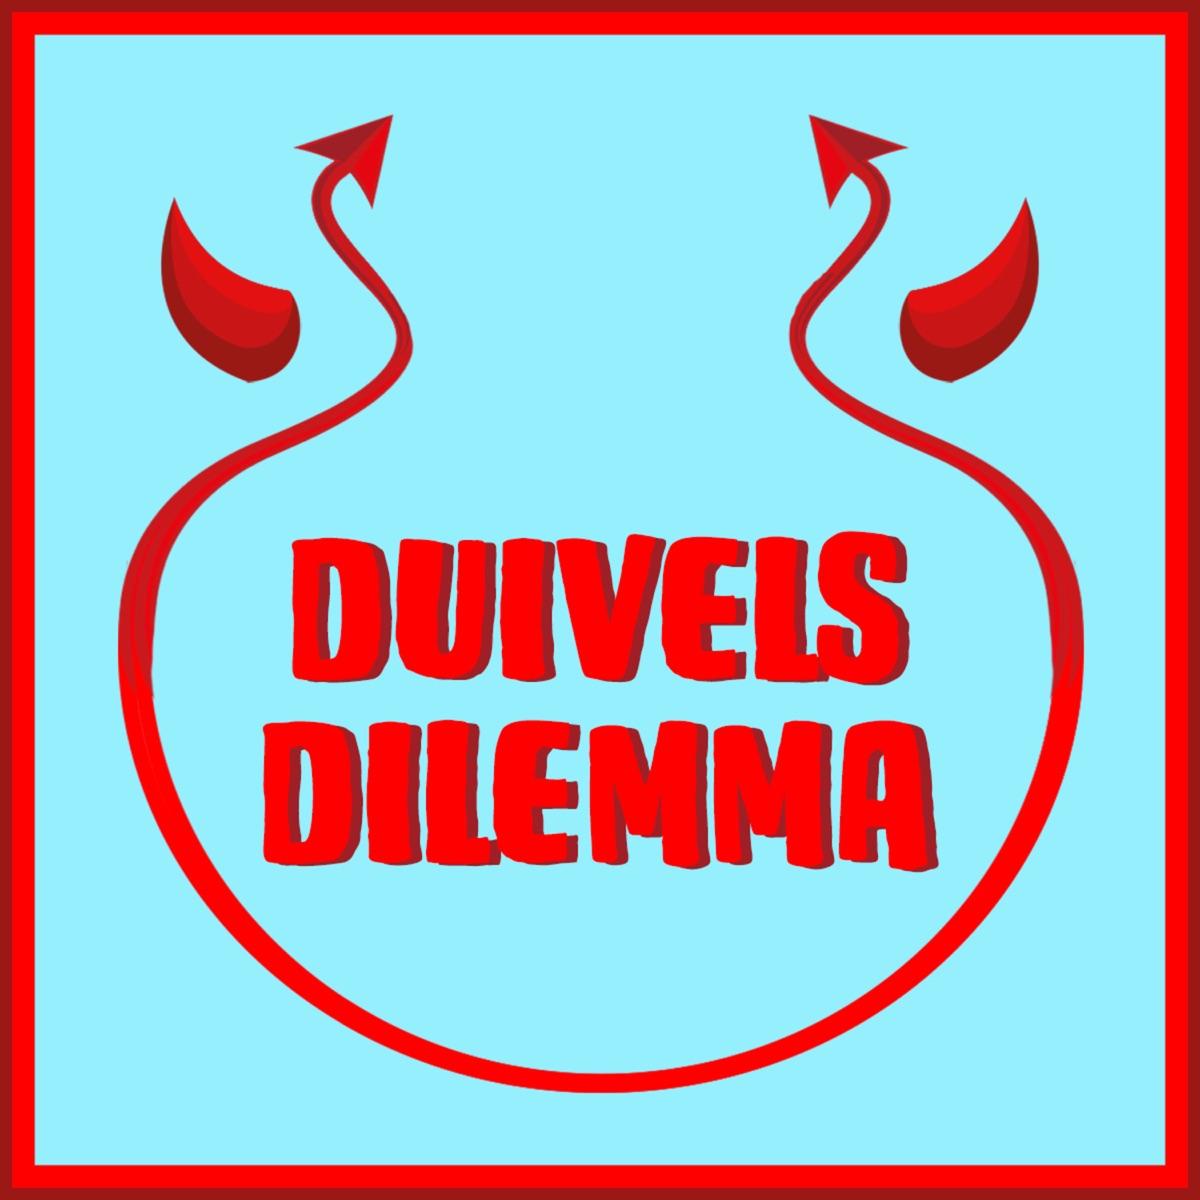 Duivels Dilemma